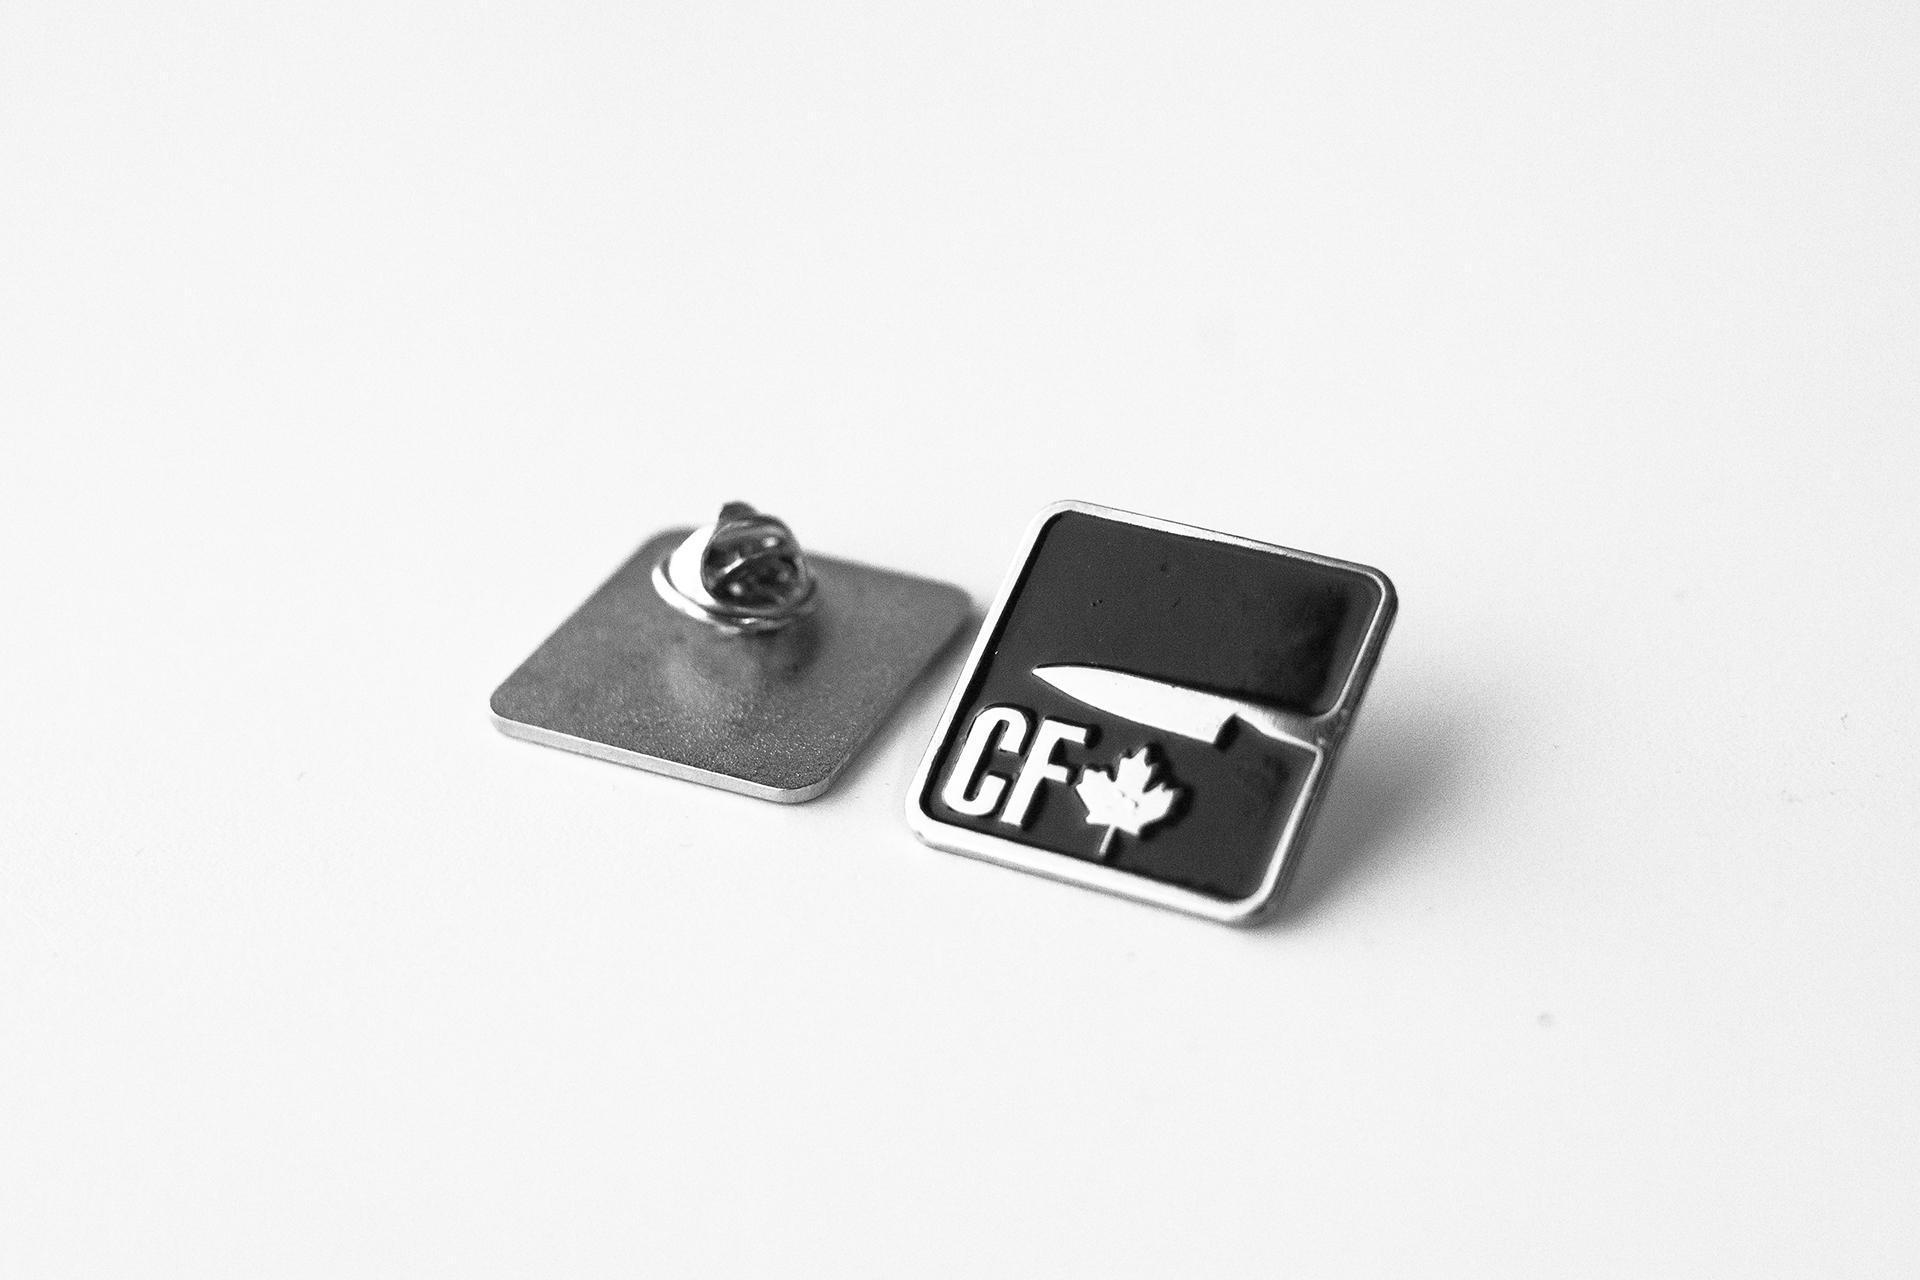 pin, branding, marketing, cf